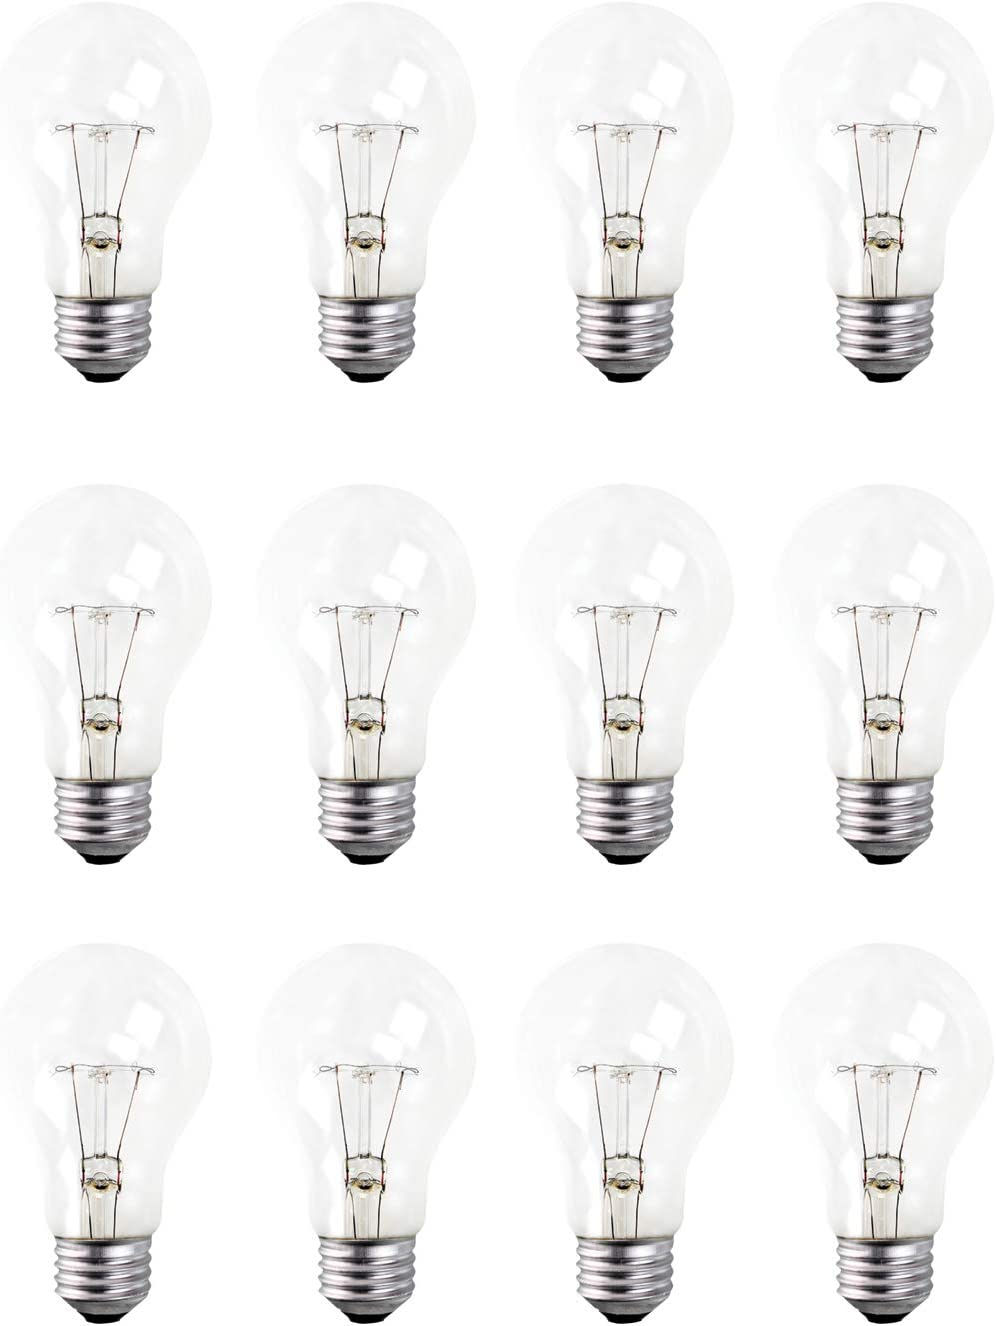 A19 Clear Incandescent Rough Service Light Bulb, 40 Watt, 2700K Soft White, E26 Medium Base, 300 Lumens, 130V (12 Pack)